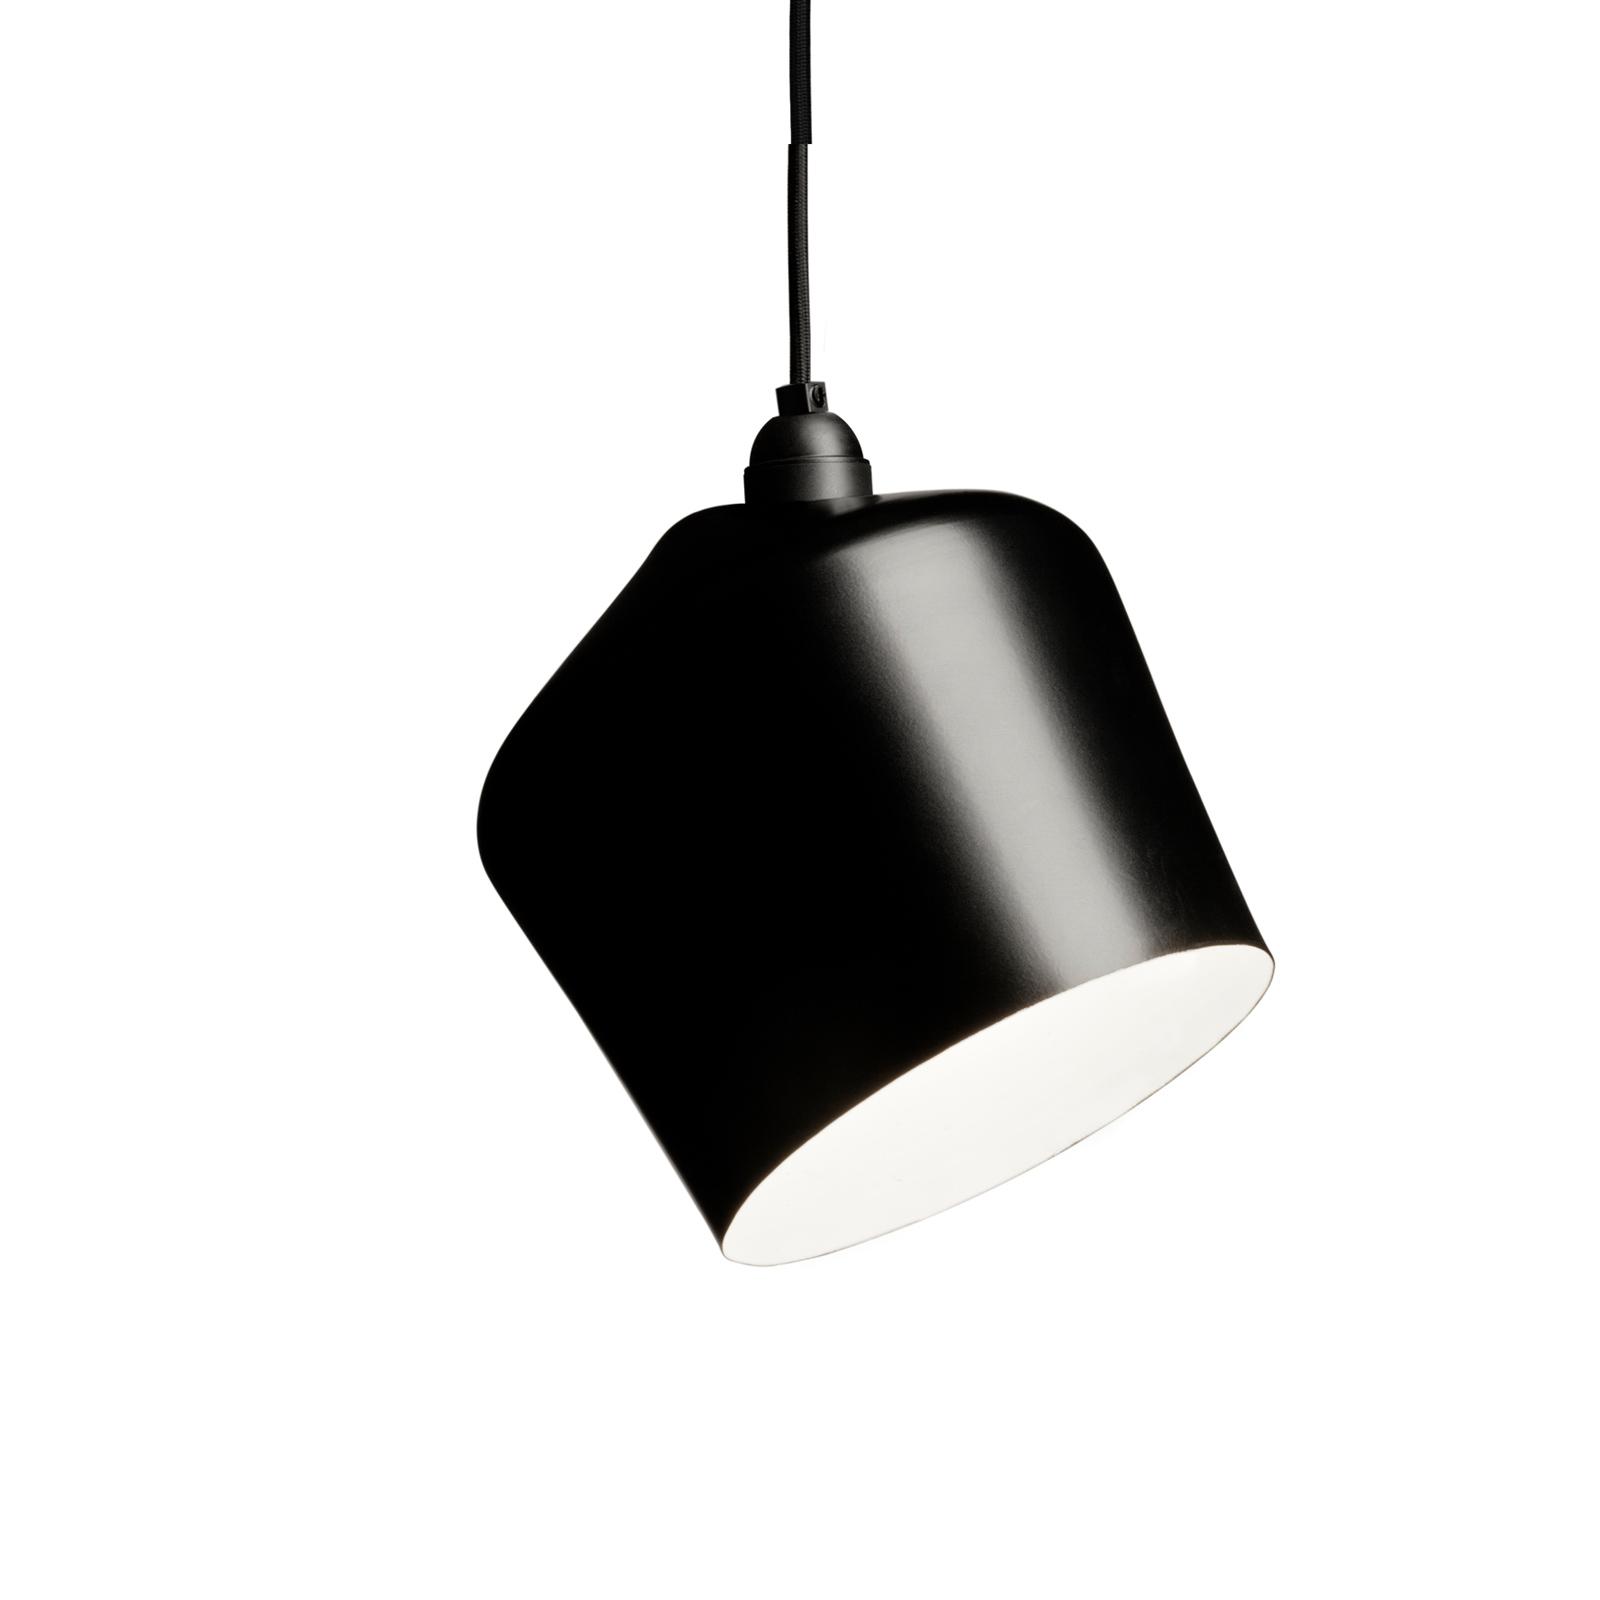 pasila hanging lamp design from scandinavia rh designfromscandinavia com hanging light fixtures design hanging lamp design ideas